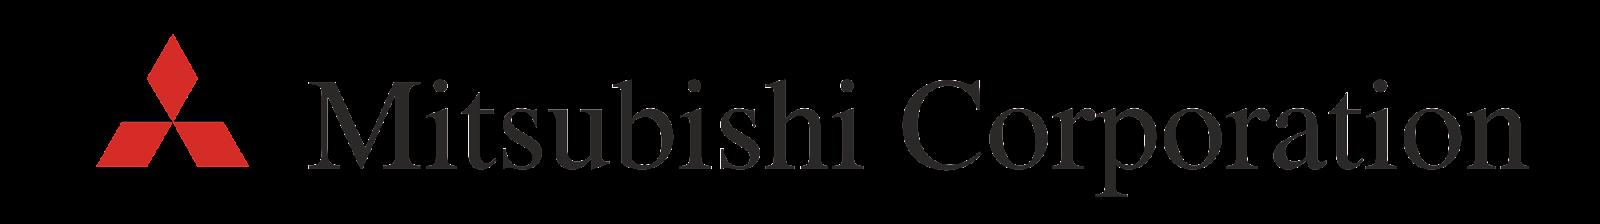 2000px-Mitsubishi-Corporation-Logo.svg.png